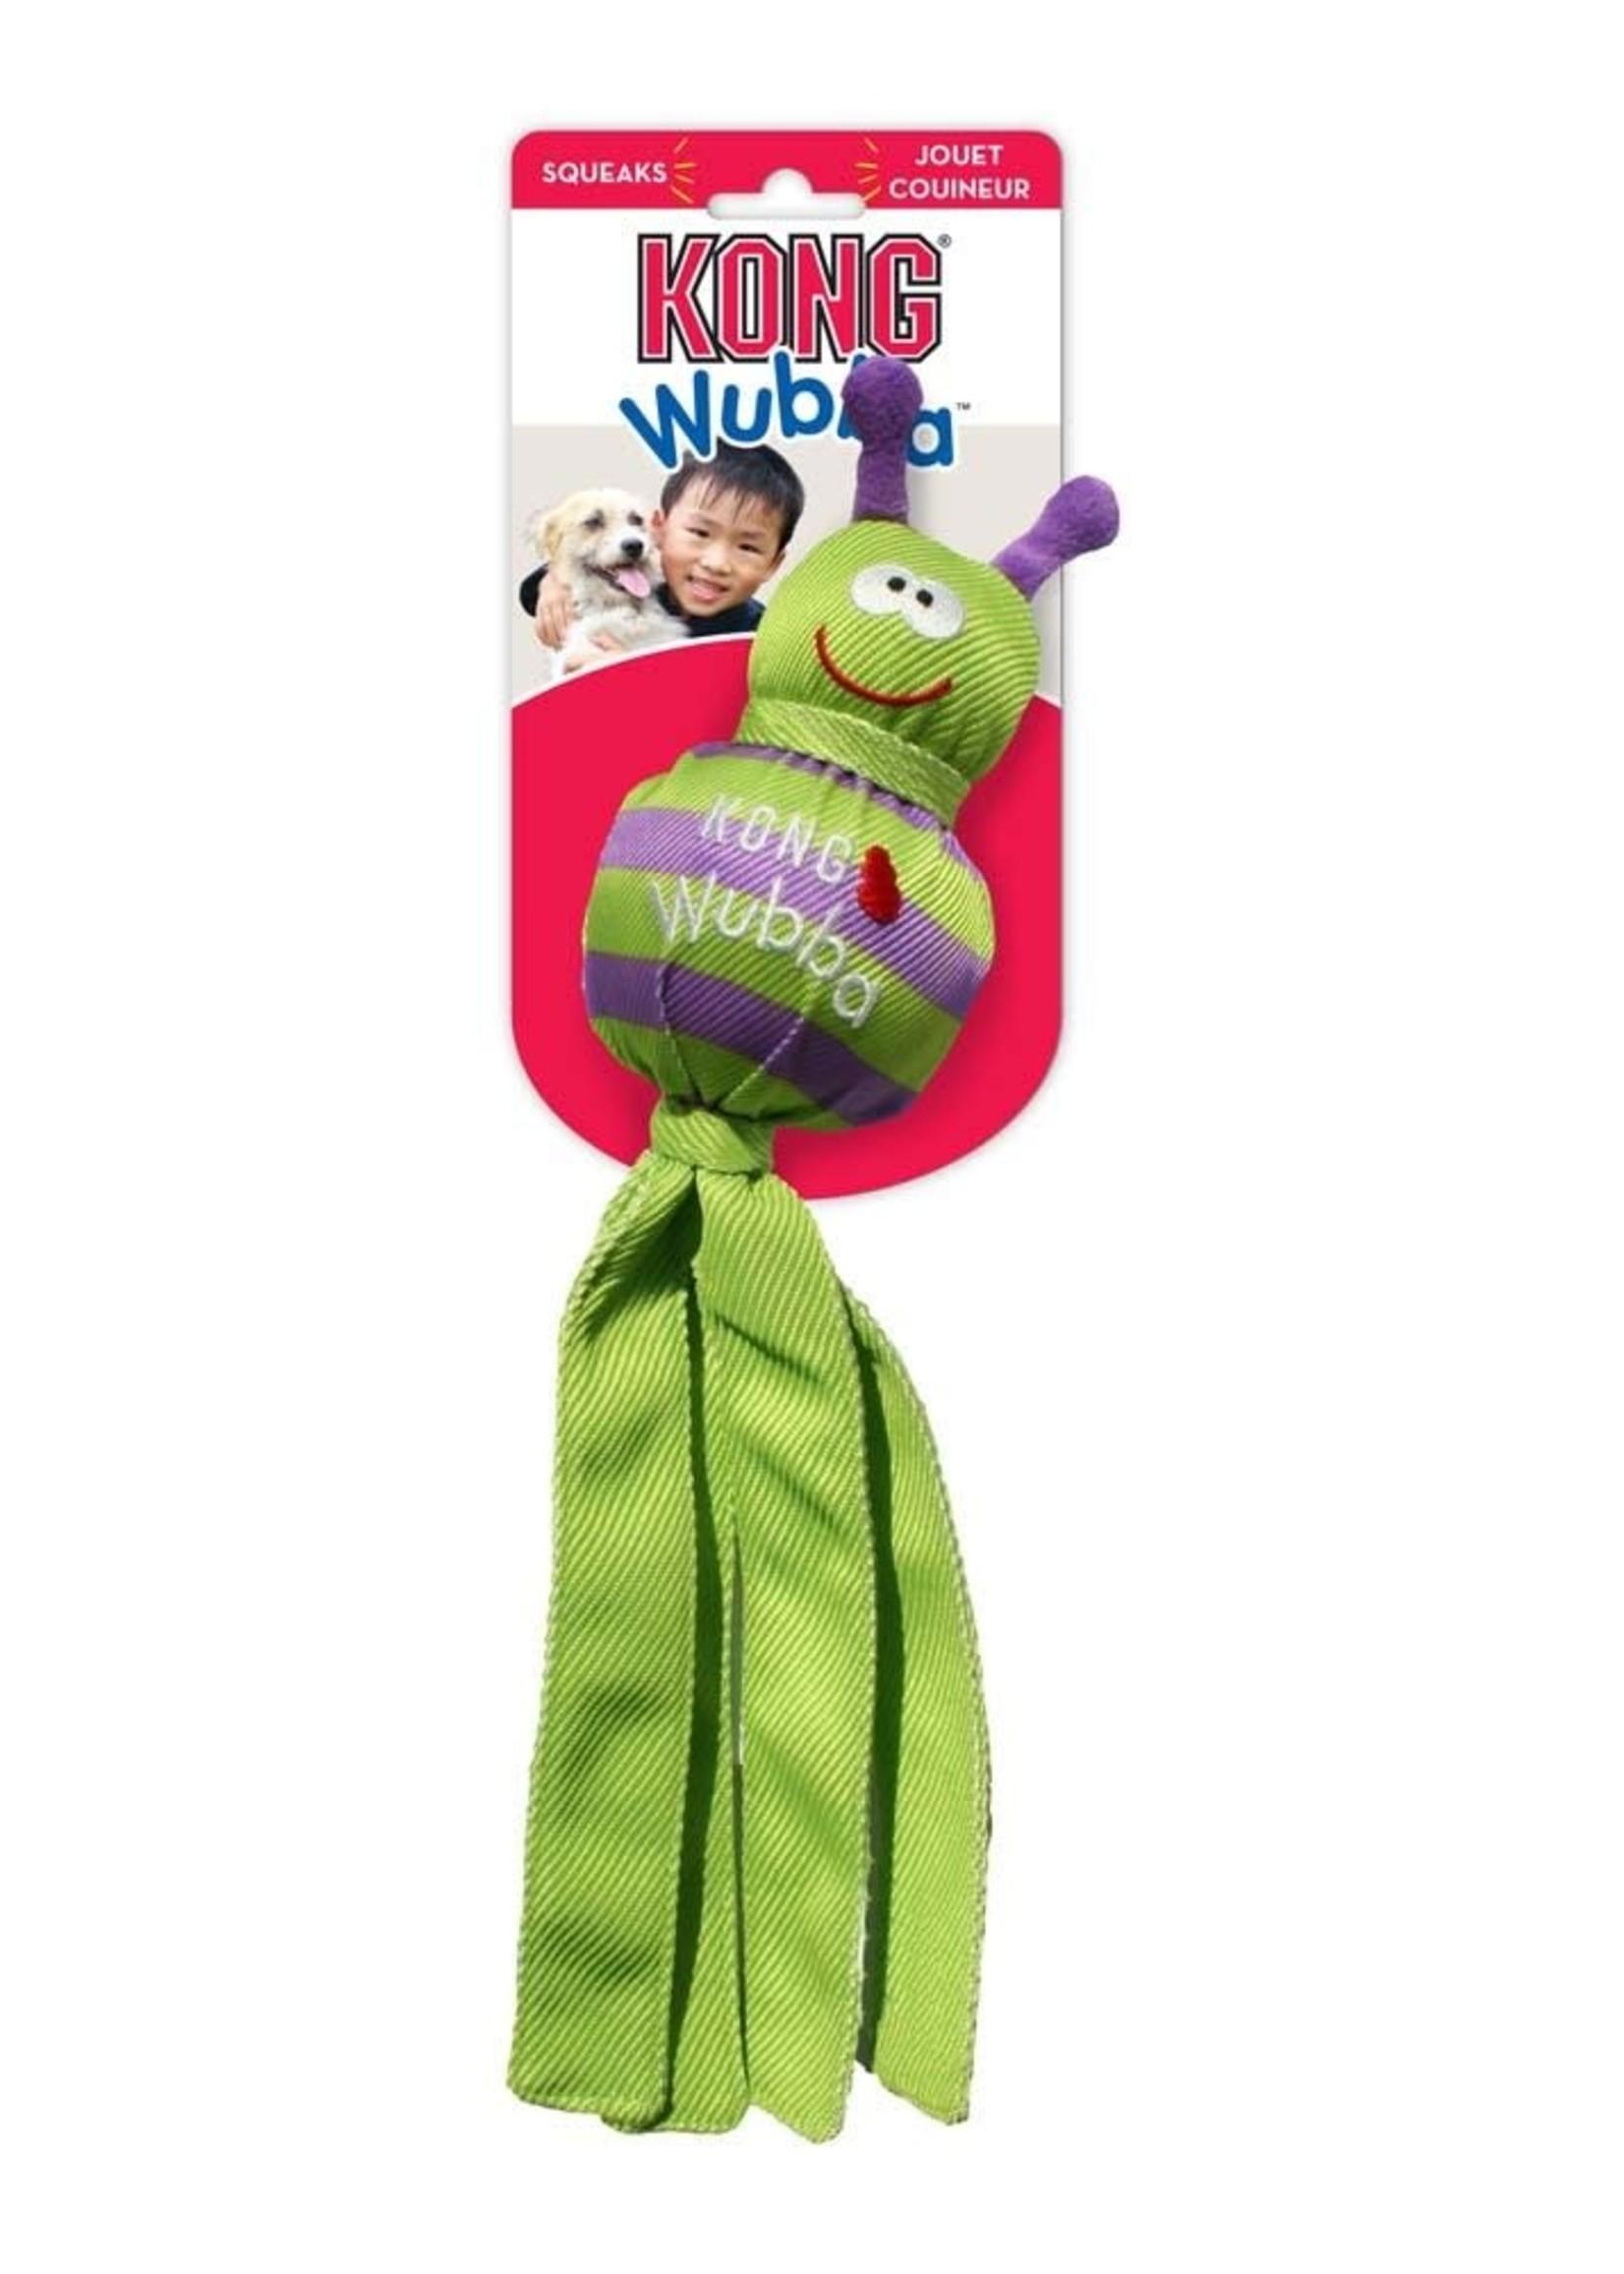 KONG COMPANY LLC KONG Wubba Bug Puppy Toy Large